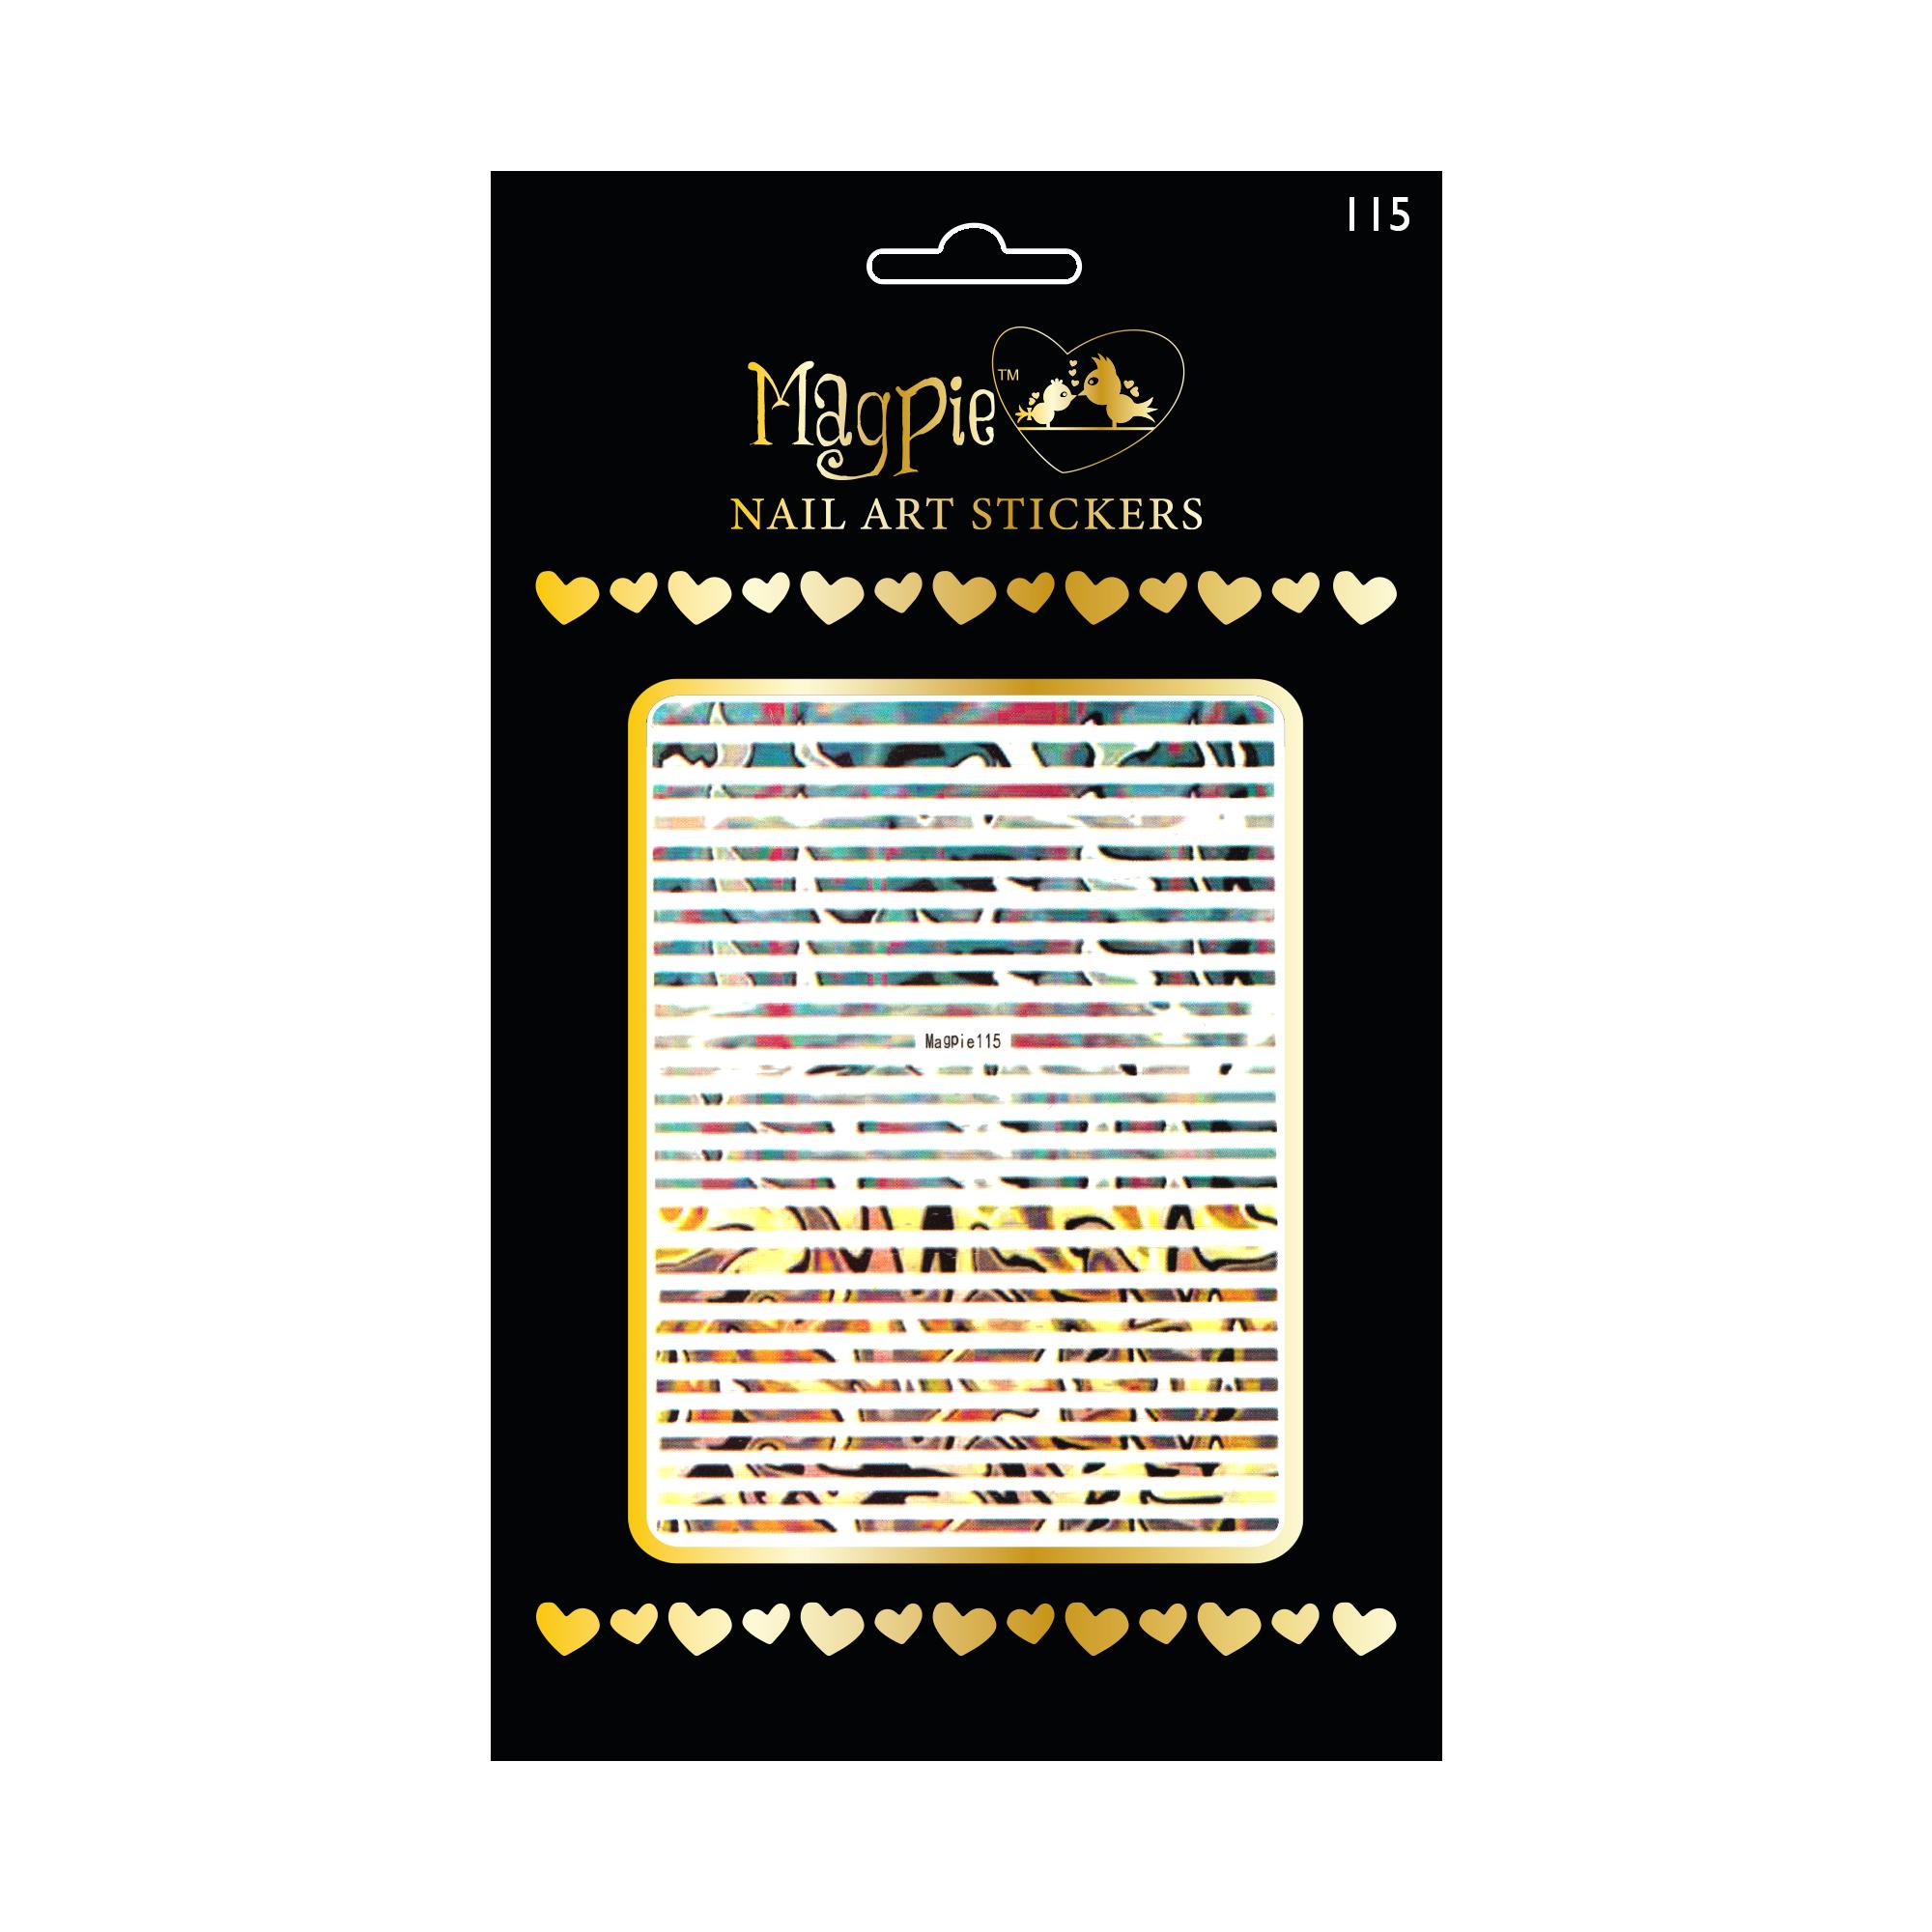 Magpie 115 stickers